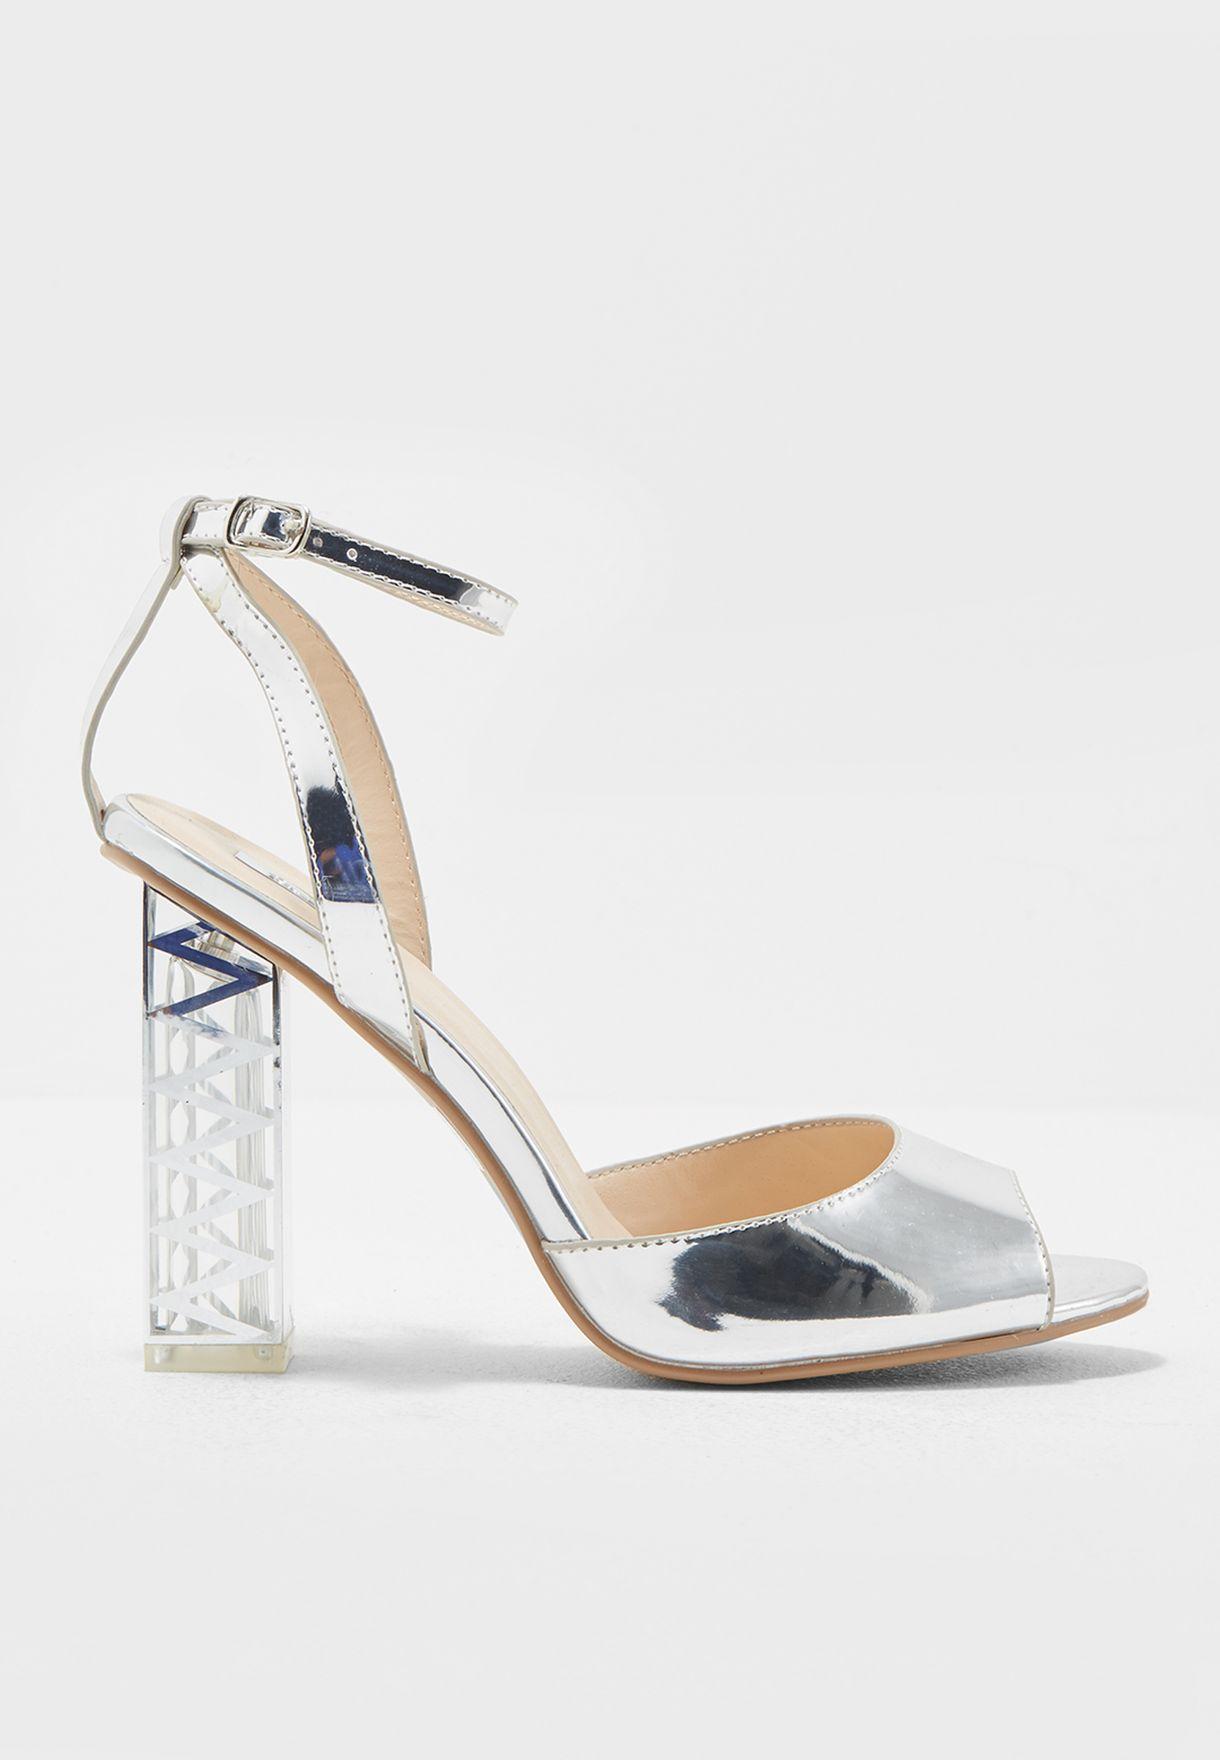 ce44e342968 Shop Qupid silver Metallic Silver Sandals With Statement Heel LUMI ...